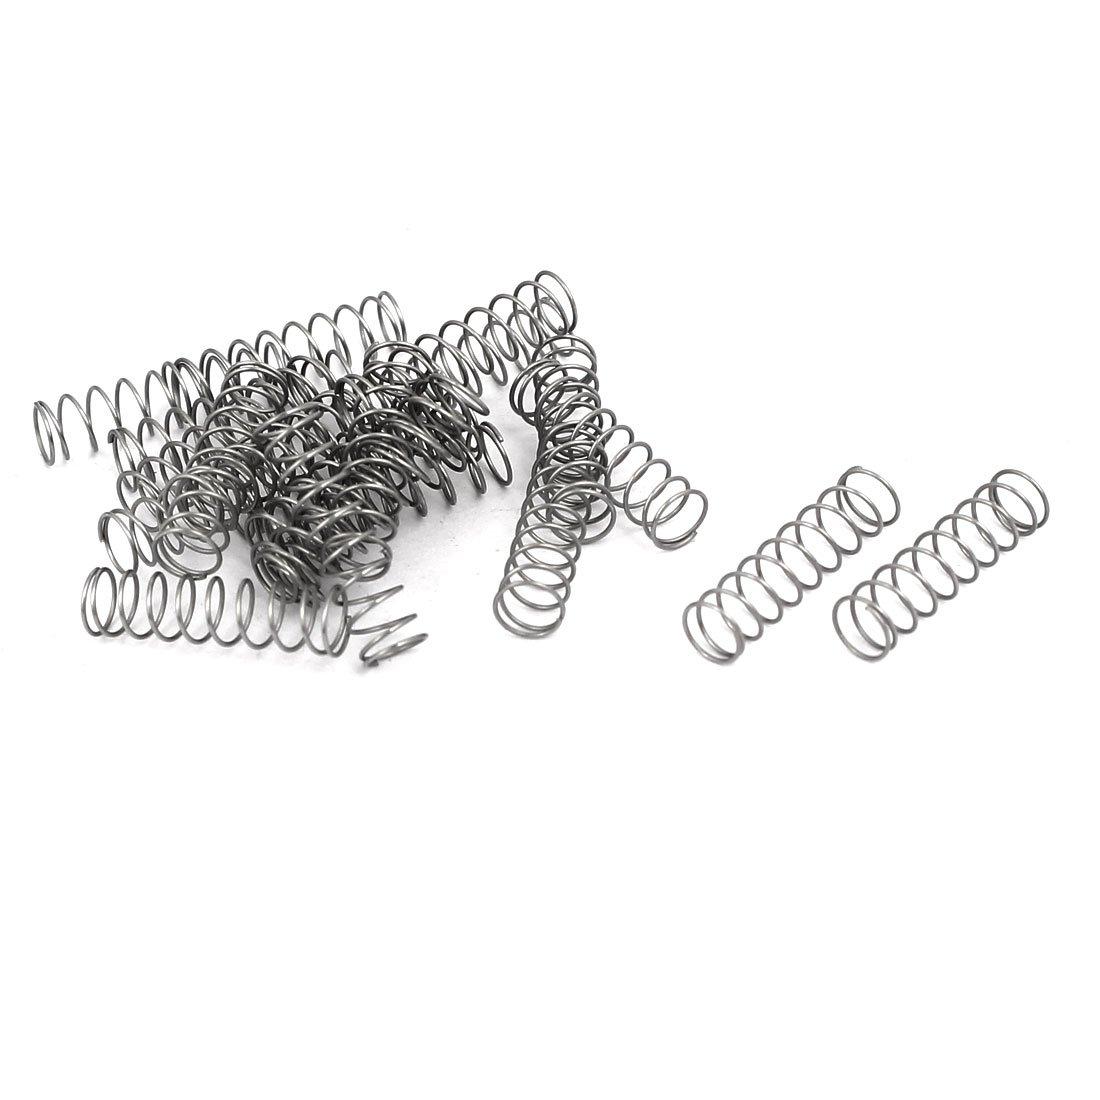 sourcingmap 0.3mmx4mmx15mm 304 in acciaio inox Molle di compressione e 20pz